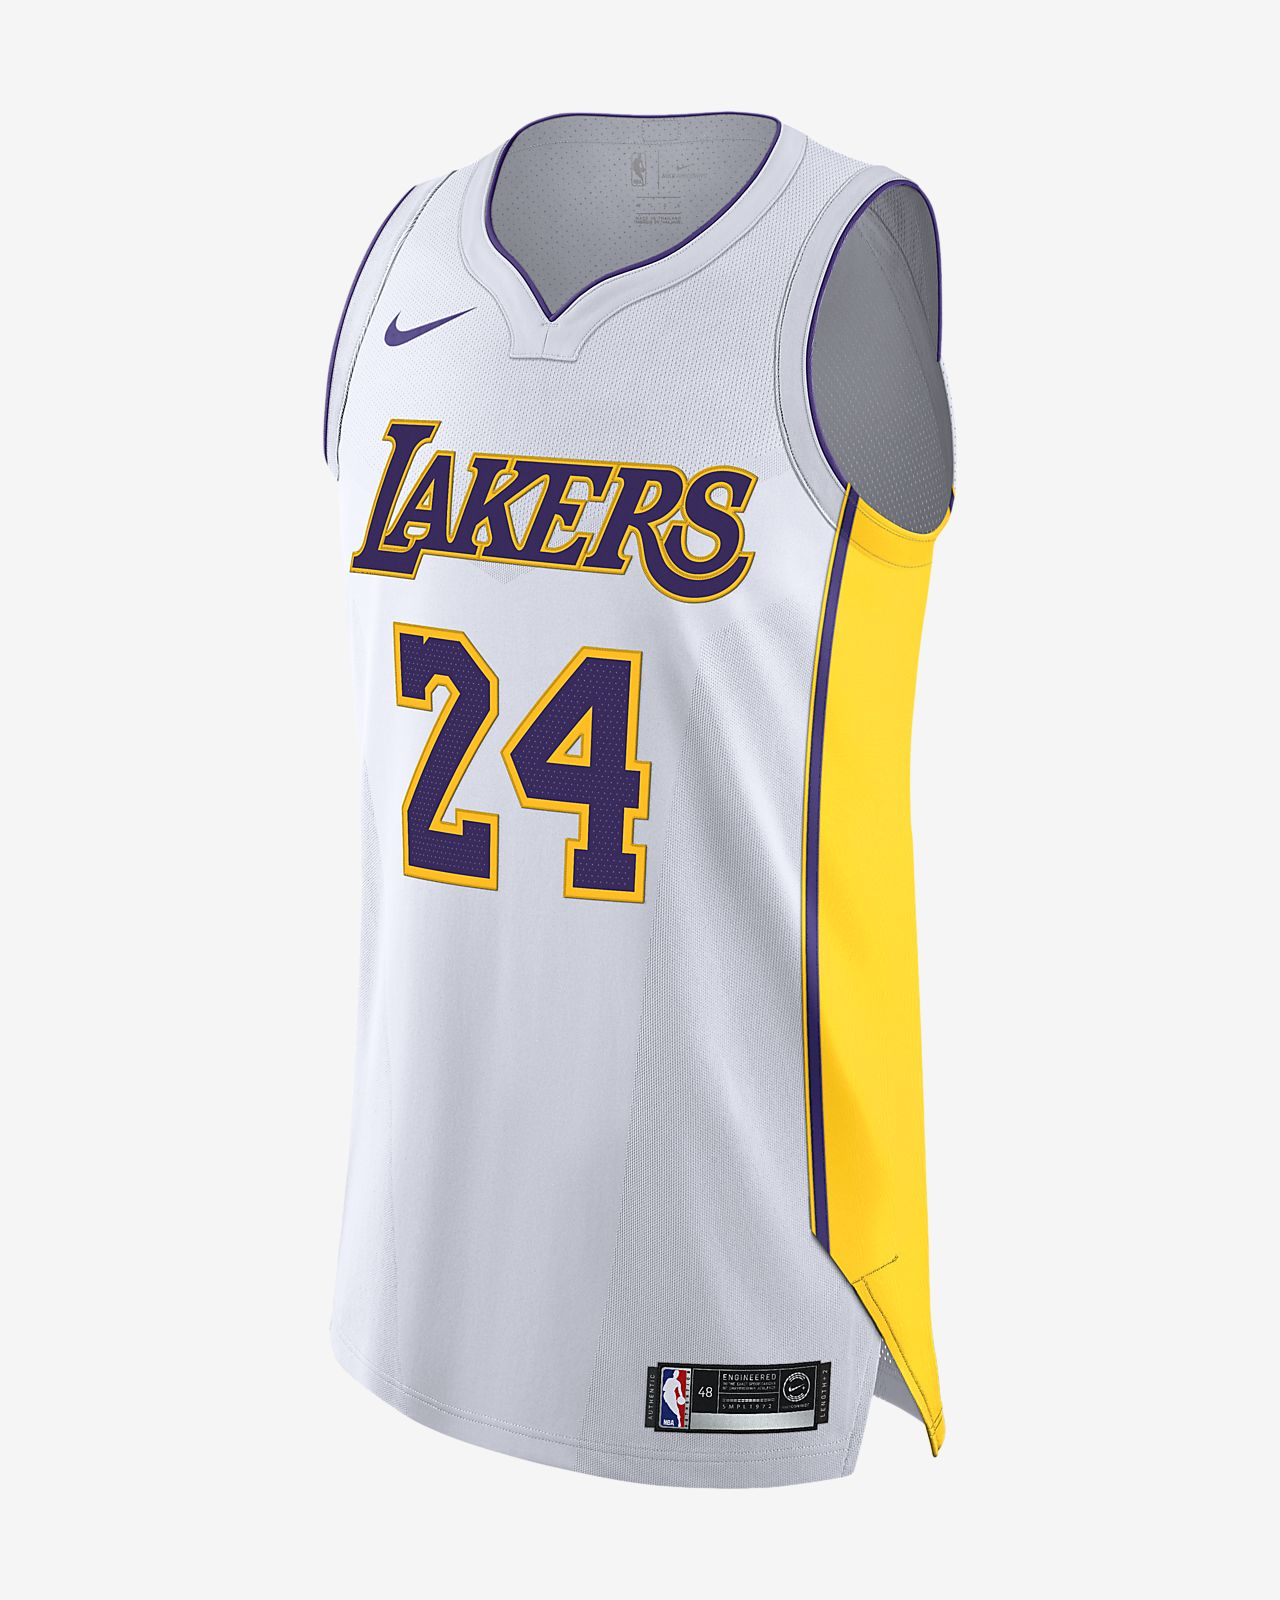 hot sale online 0f75b 209b1 ... Nike NBA Connected Jersey Kobe Bryant Association Edition Authentic (Los  Angeles Lakers) för män